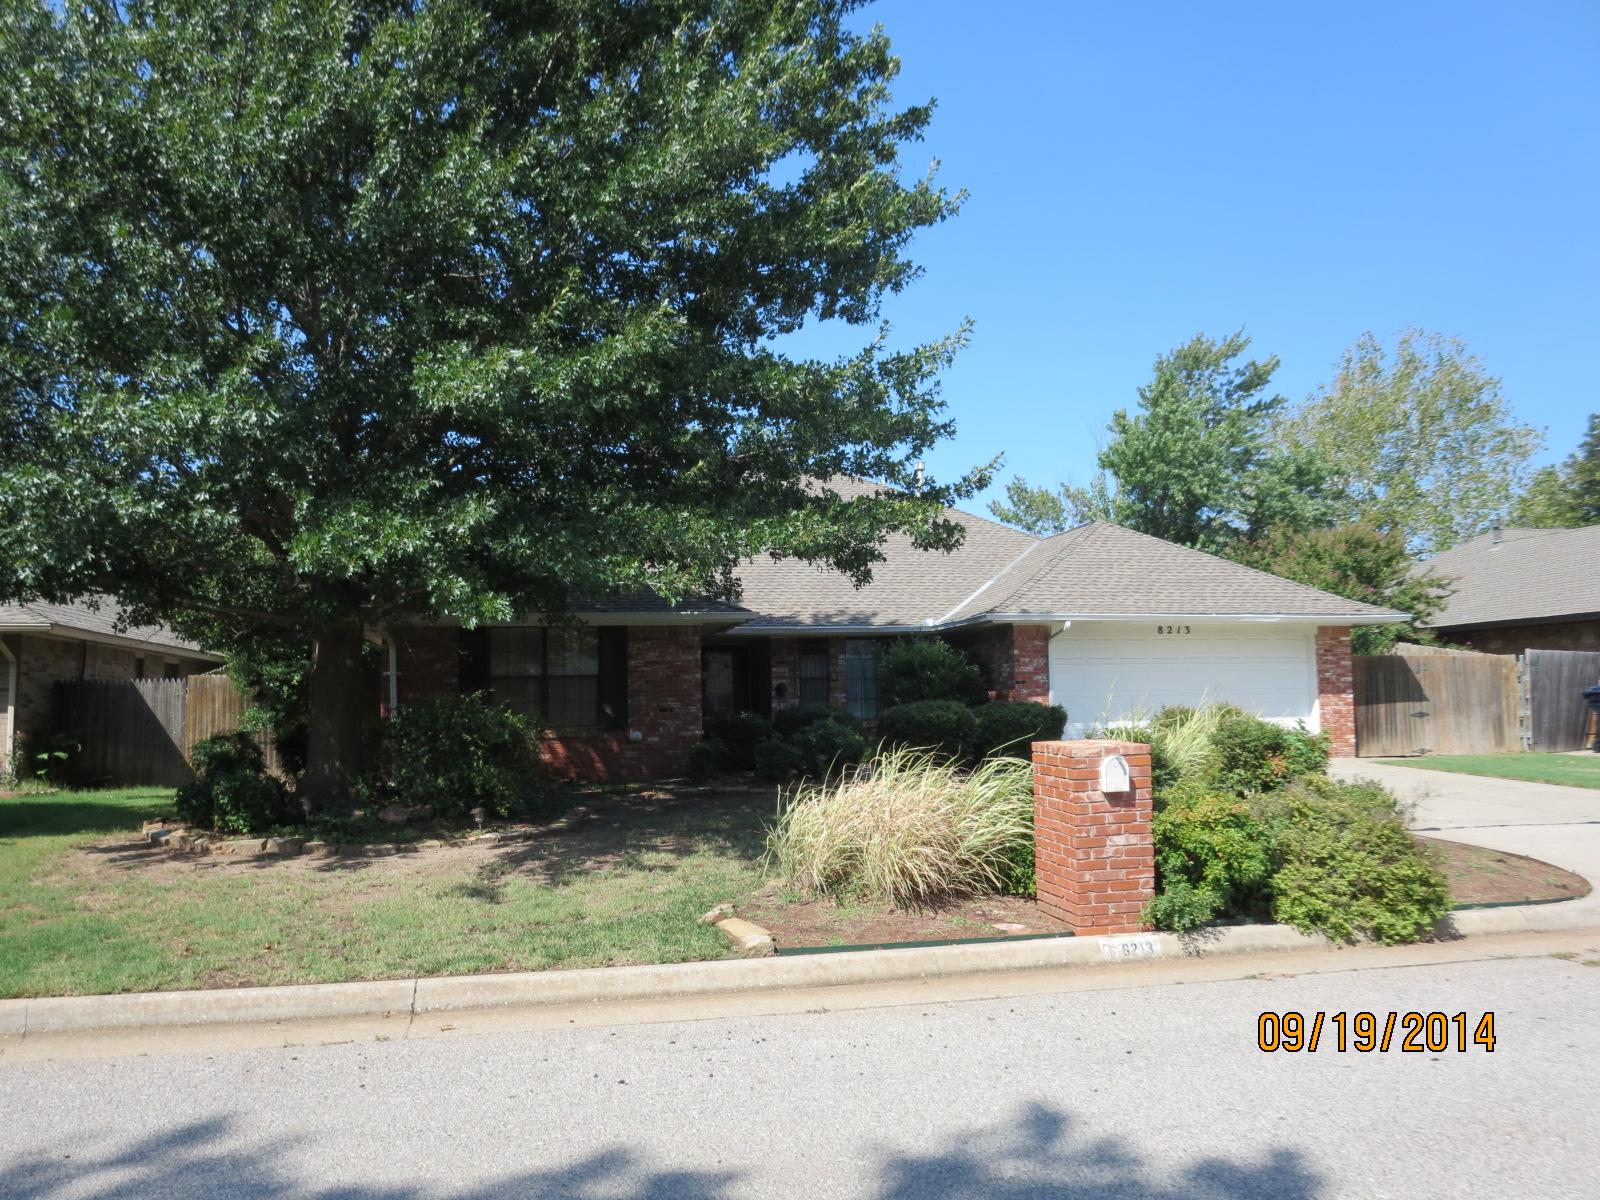 8213 Canna Ln, Oklahoma City, OK 73132